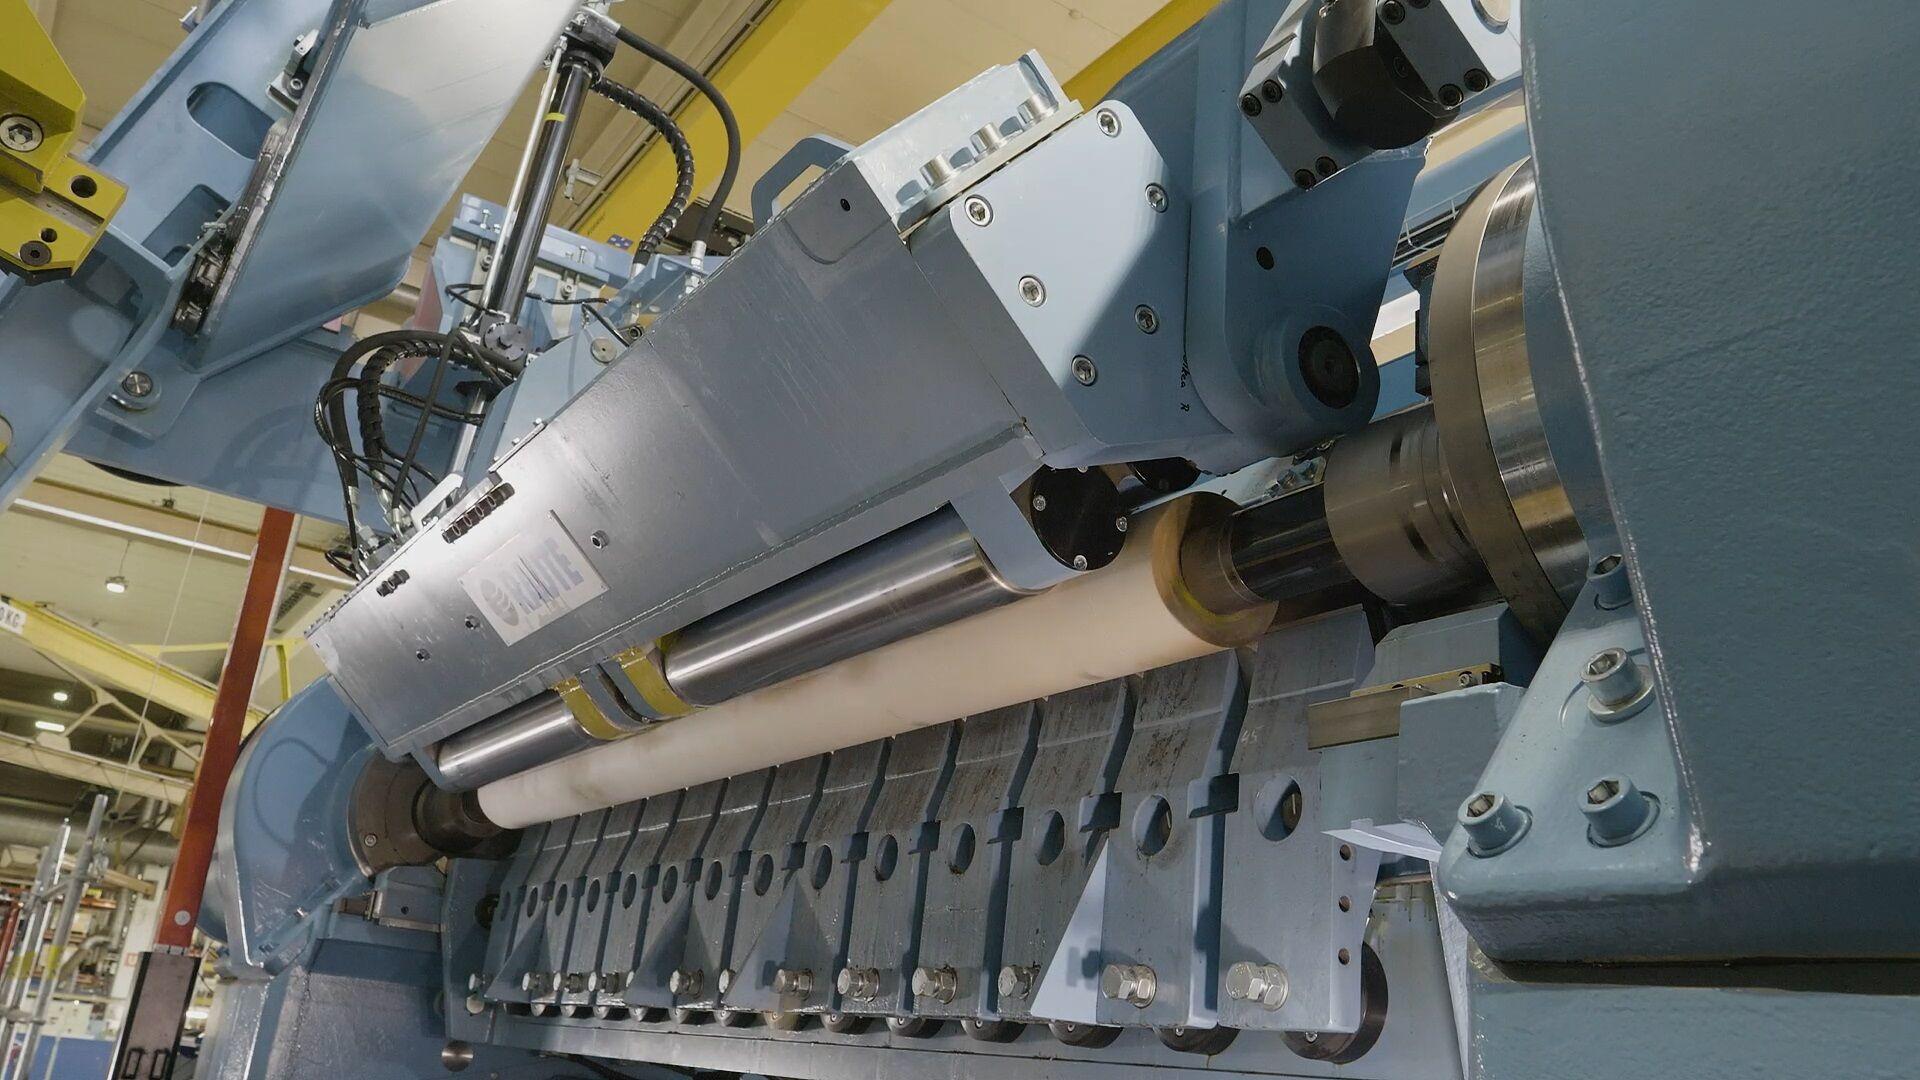 The lathe's optimal peeling geometry (OPG) ensures high quality veneer from surface to core.